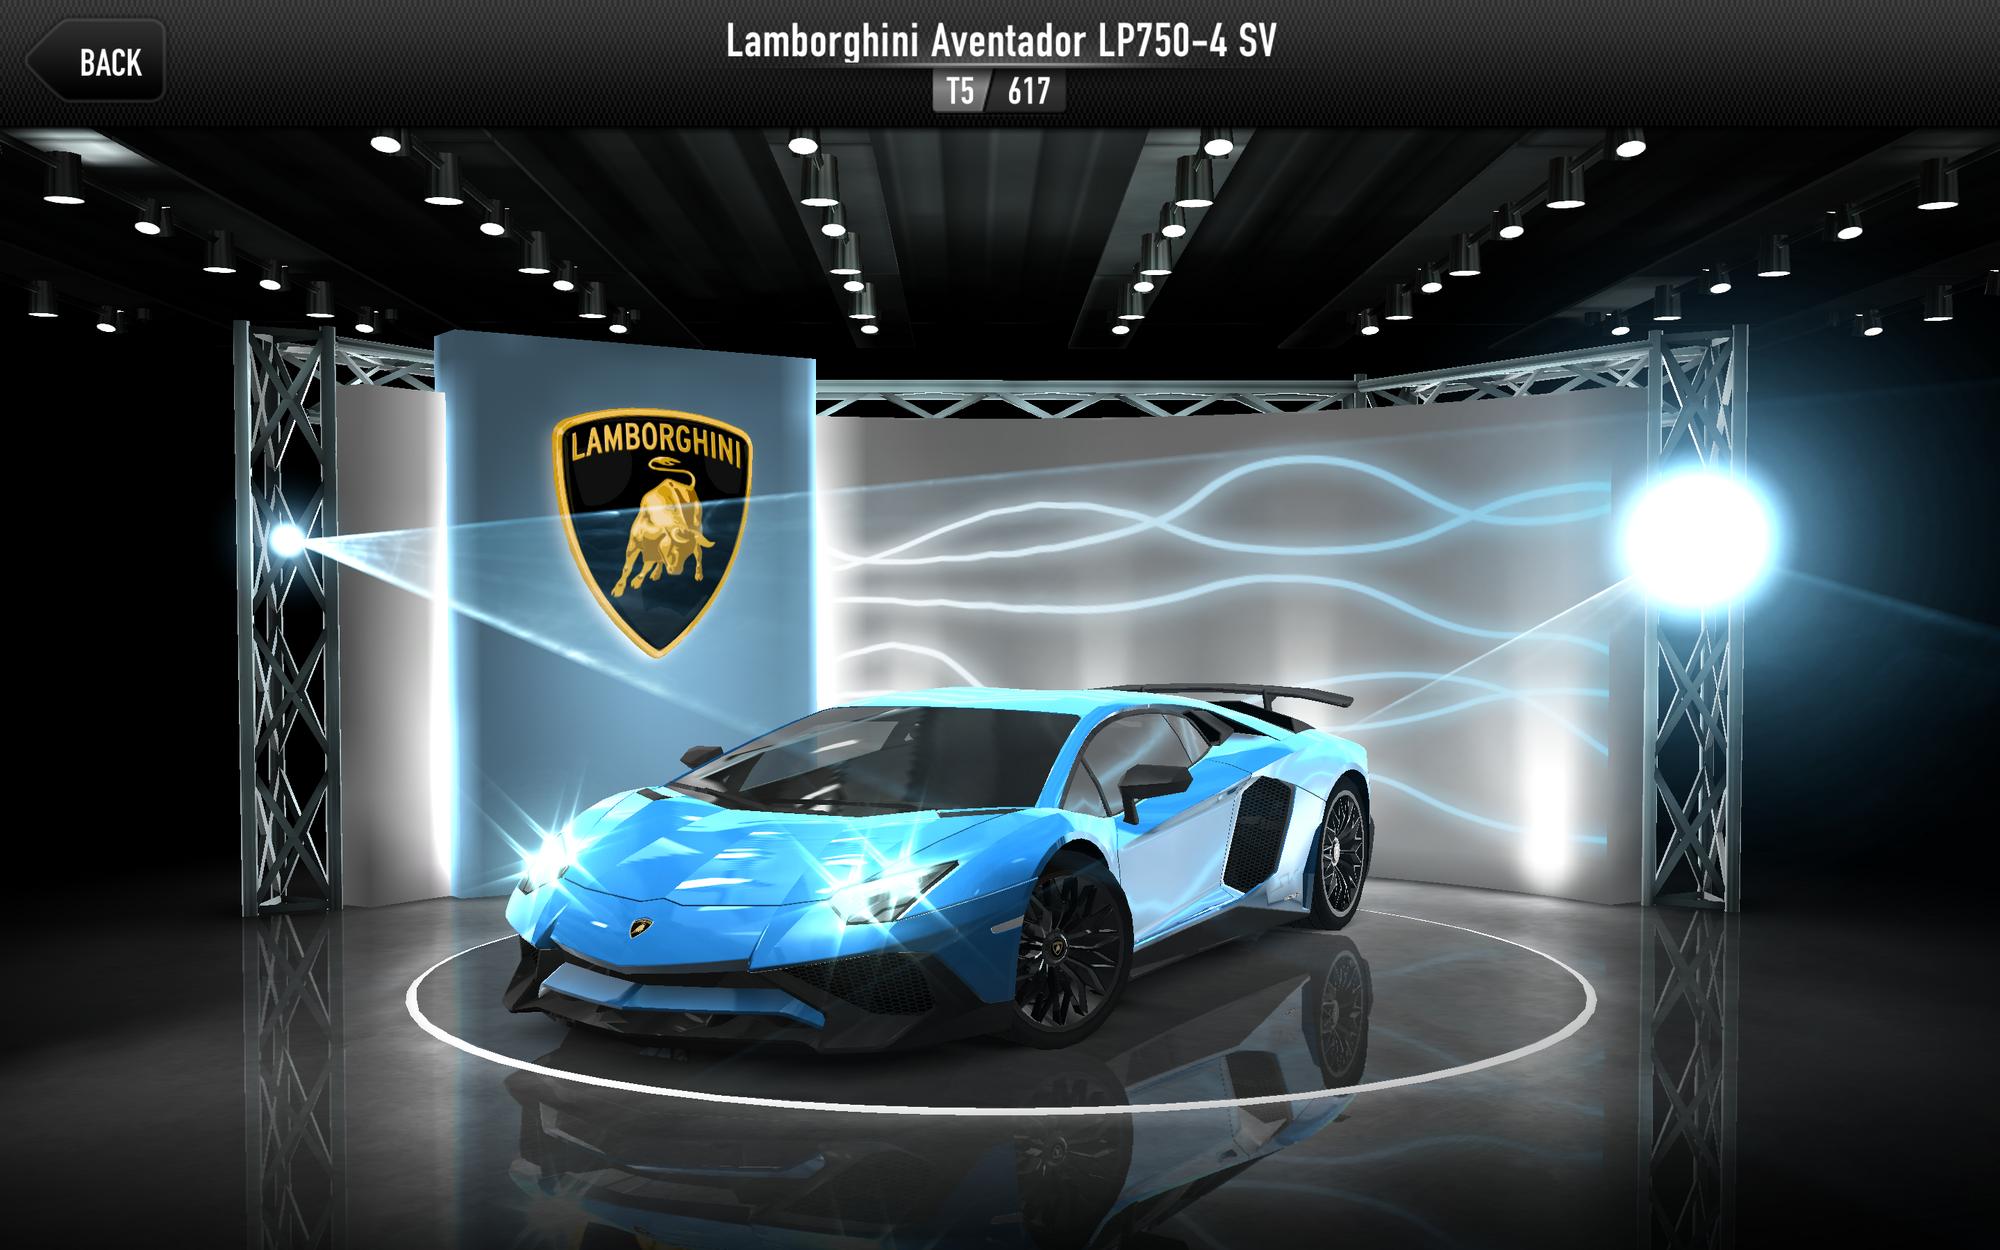 Lamborghini Aventador Lp750 4 Sv Csr Racing Wiki